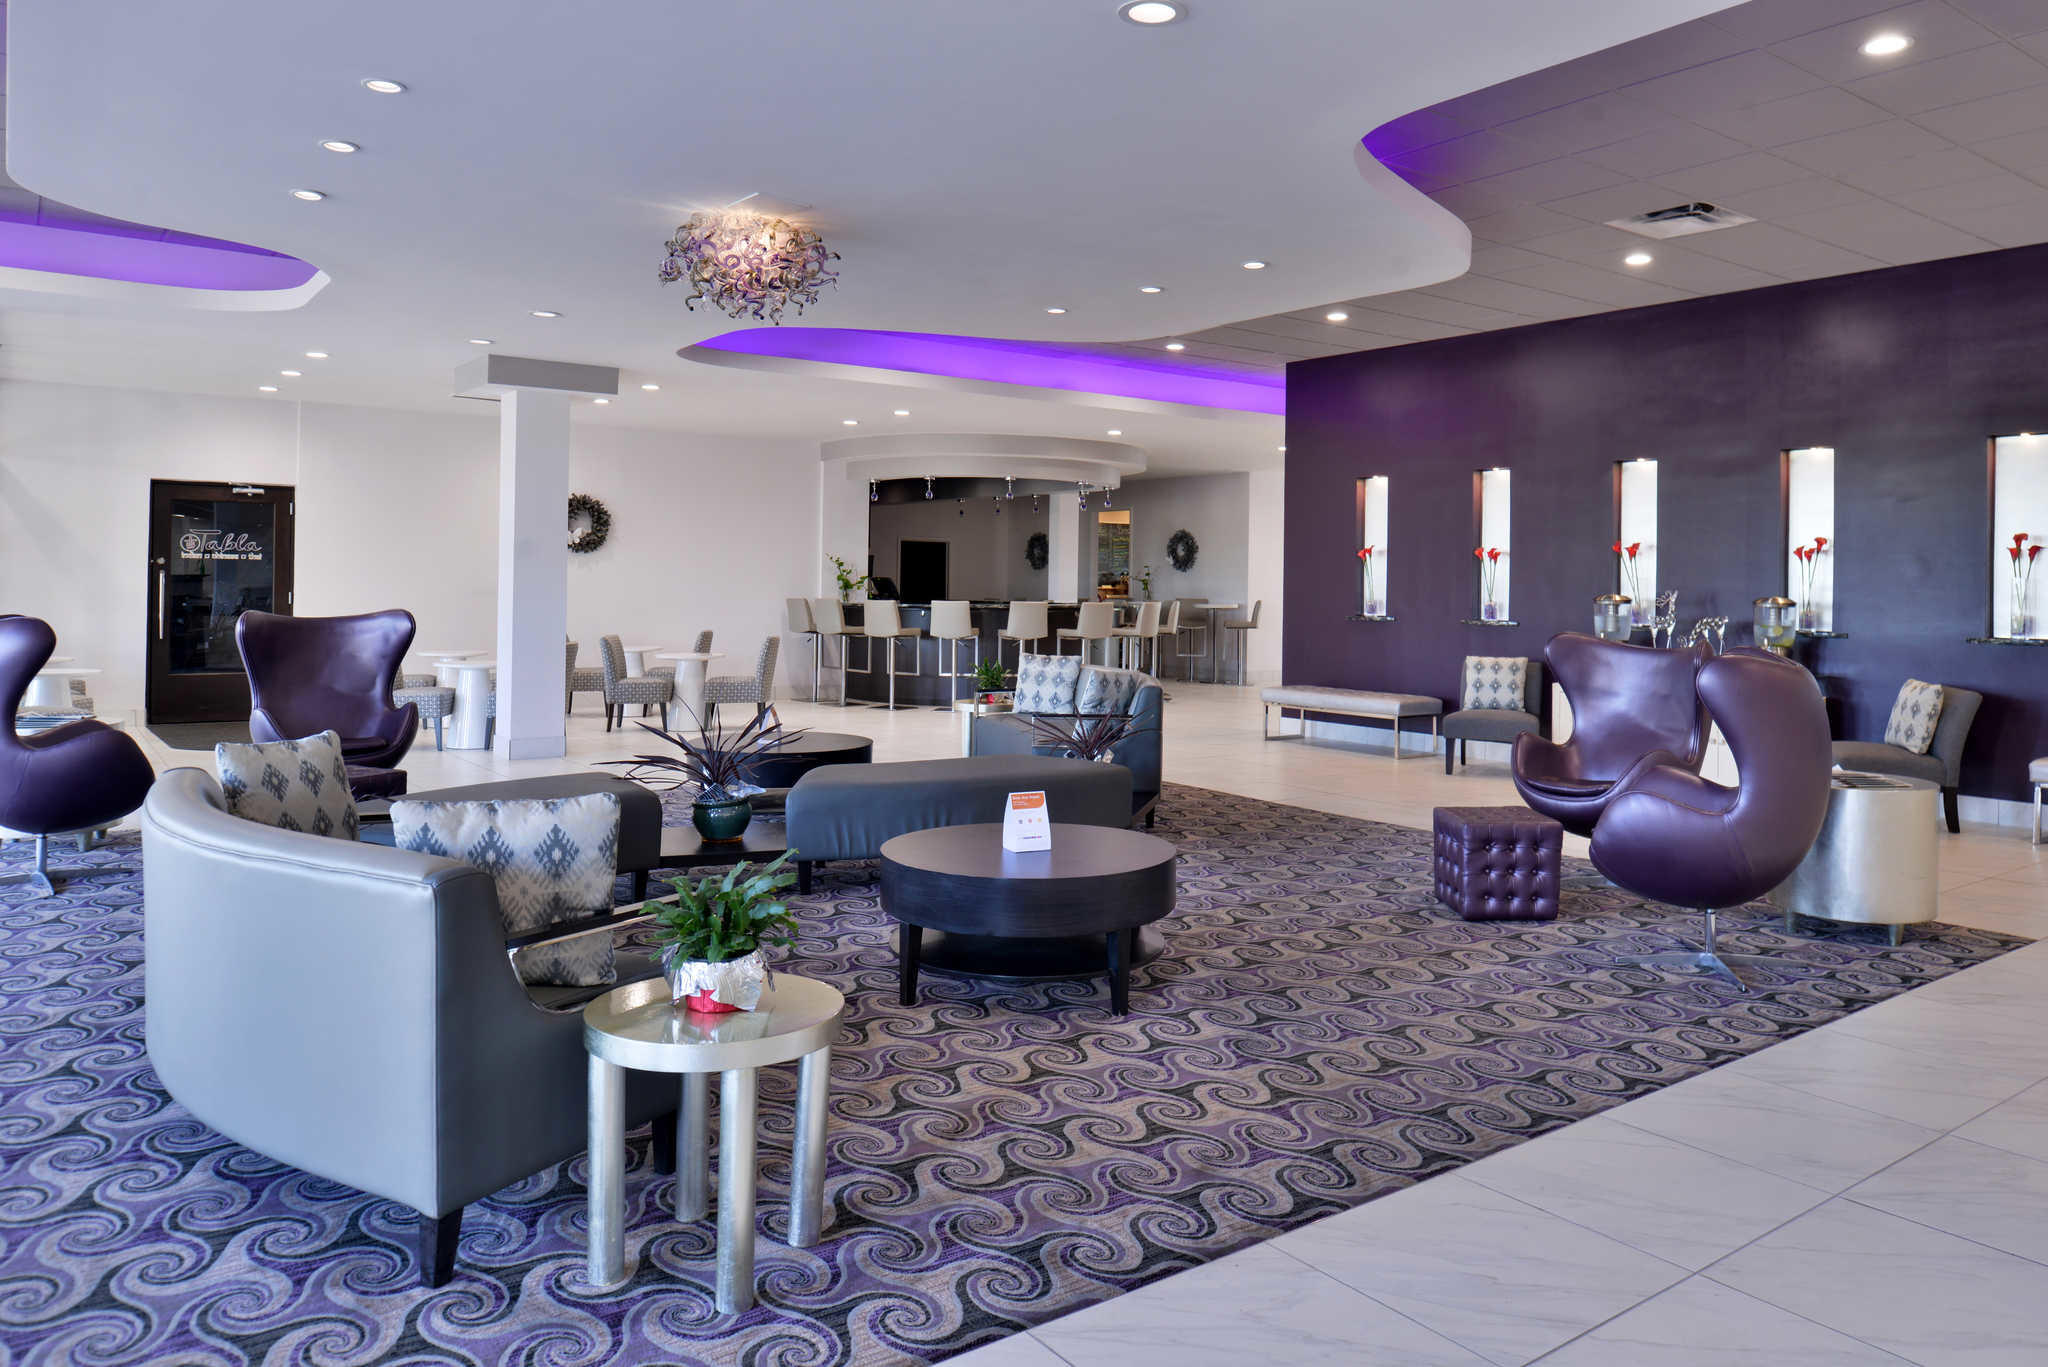 Clarion Inn & Suites Orlando near Theme Parks image 7